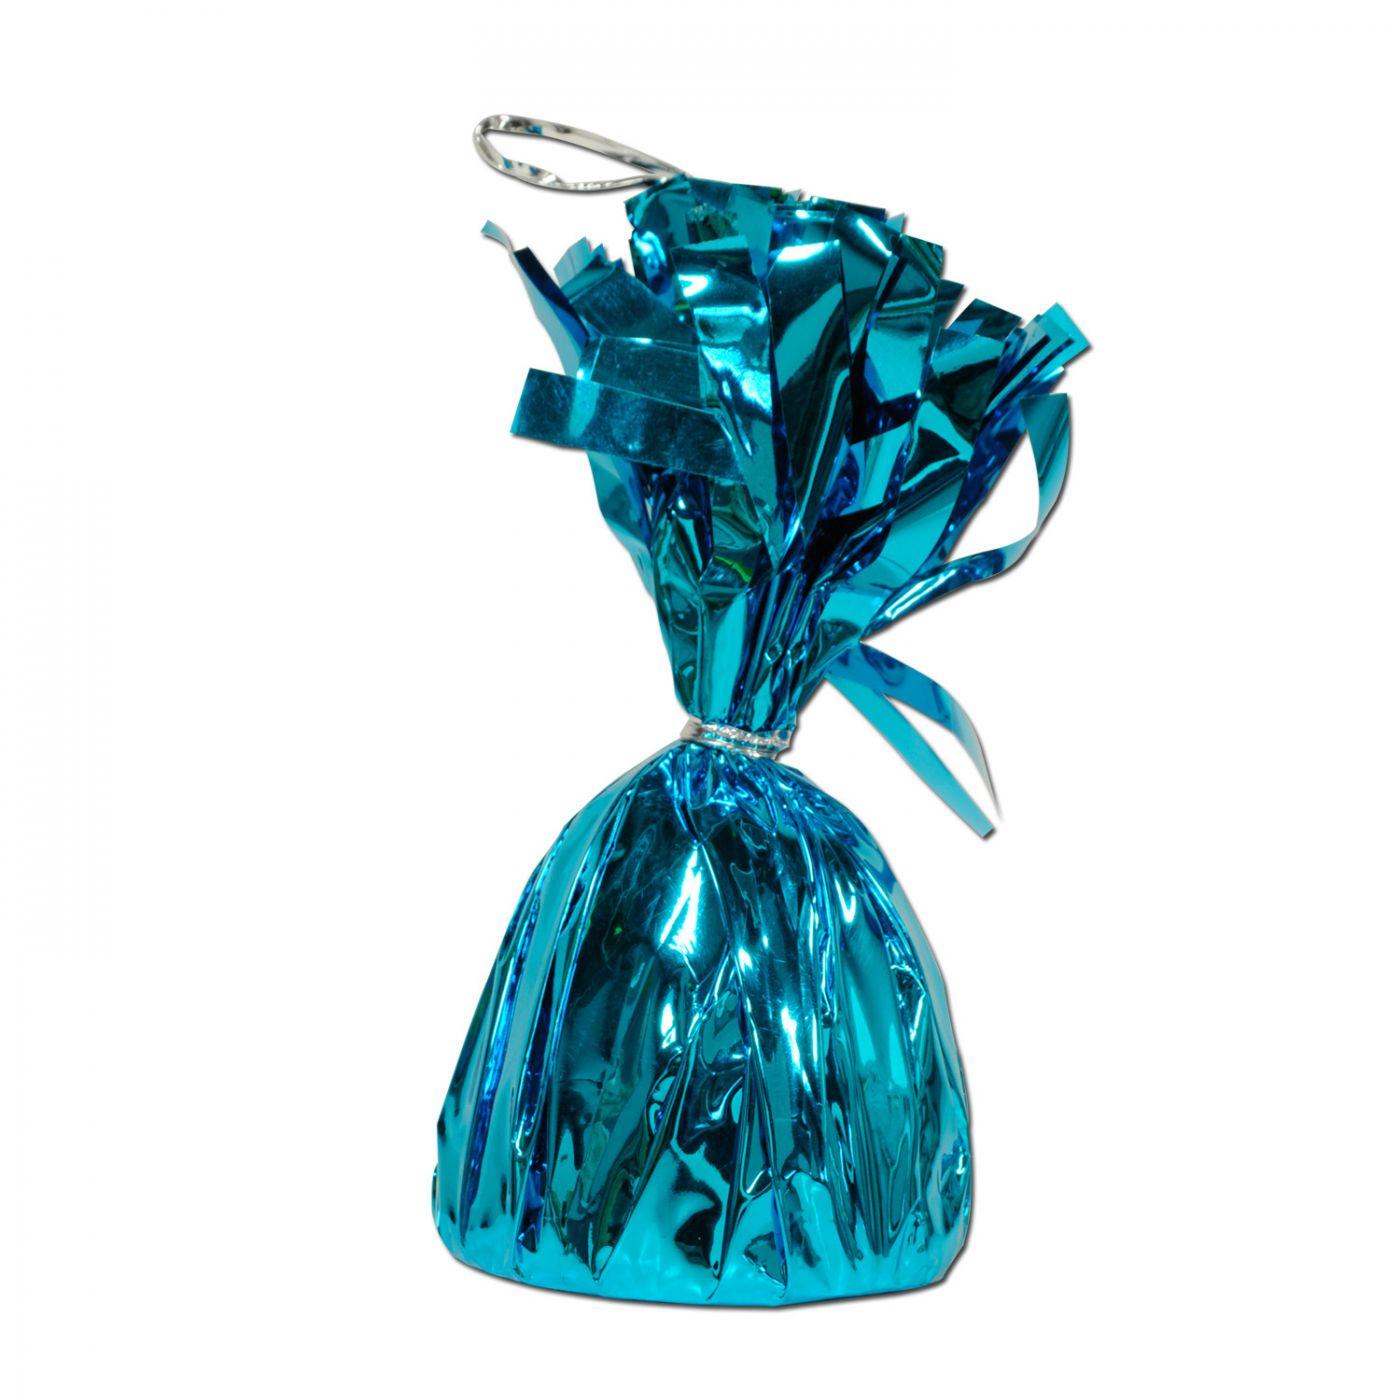 Metallic Wrapped Balloon Weight image